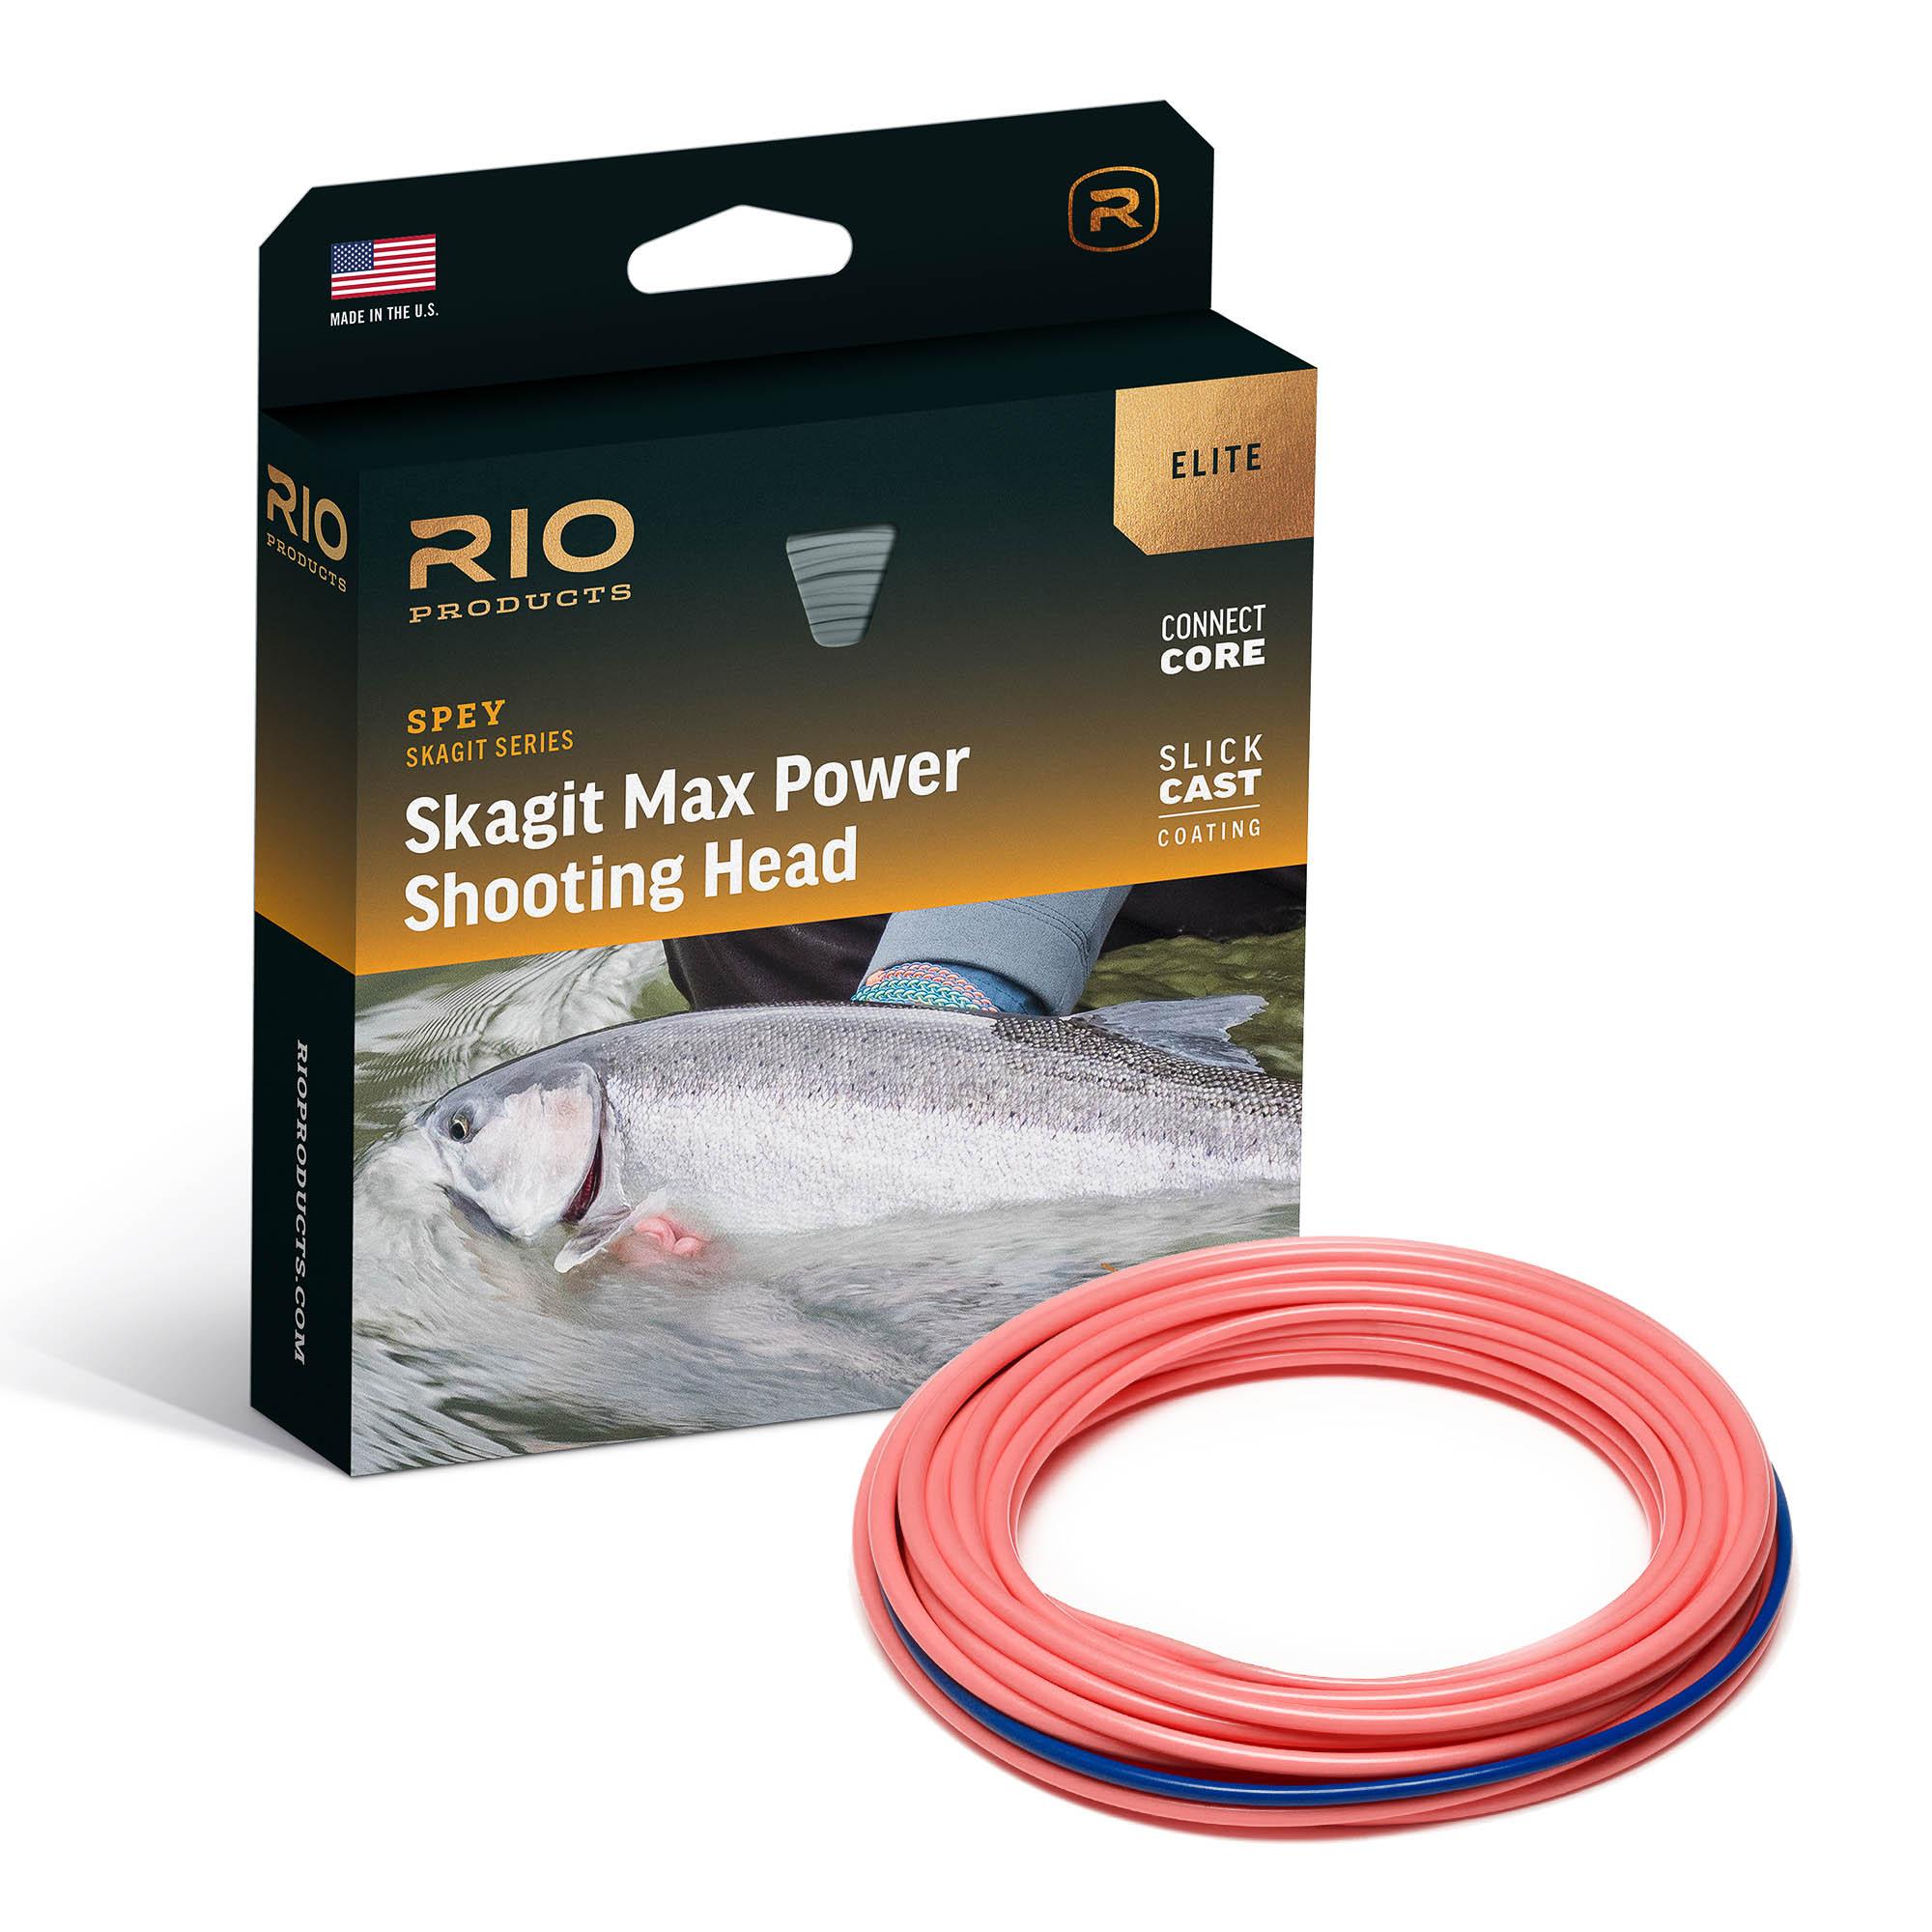 RIO ELITE SKAGIT MAX POWER HEAD